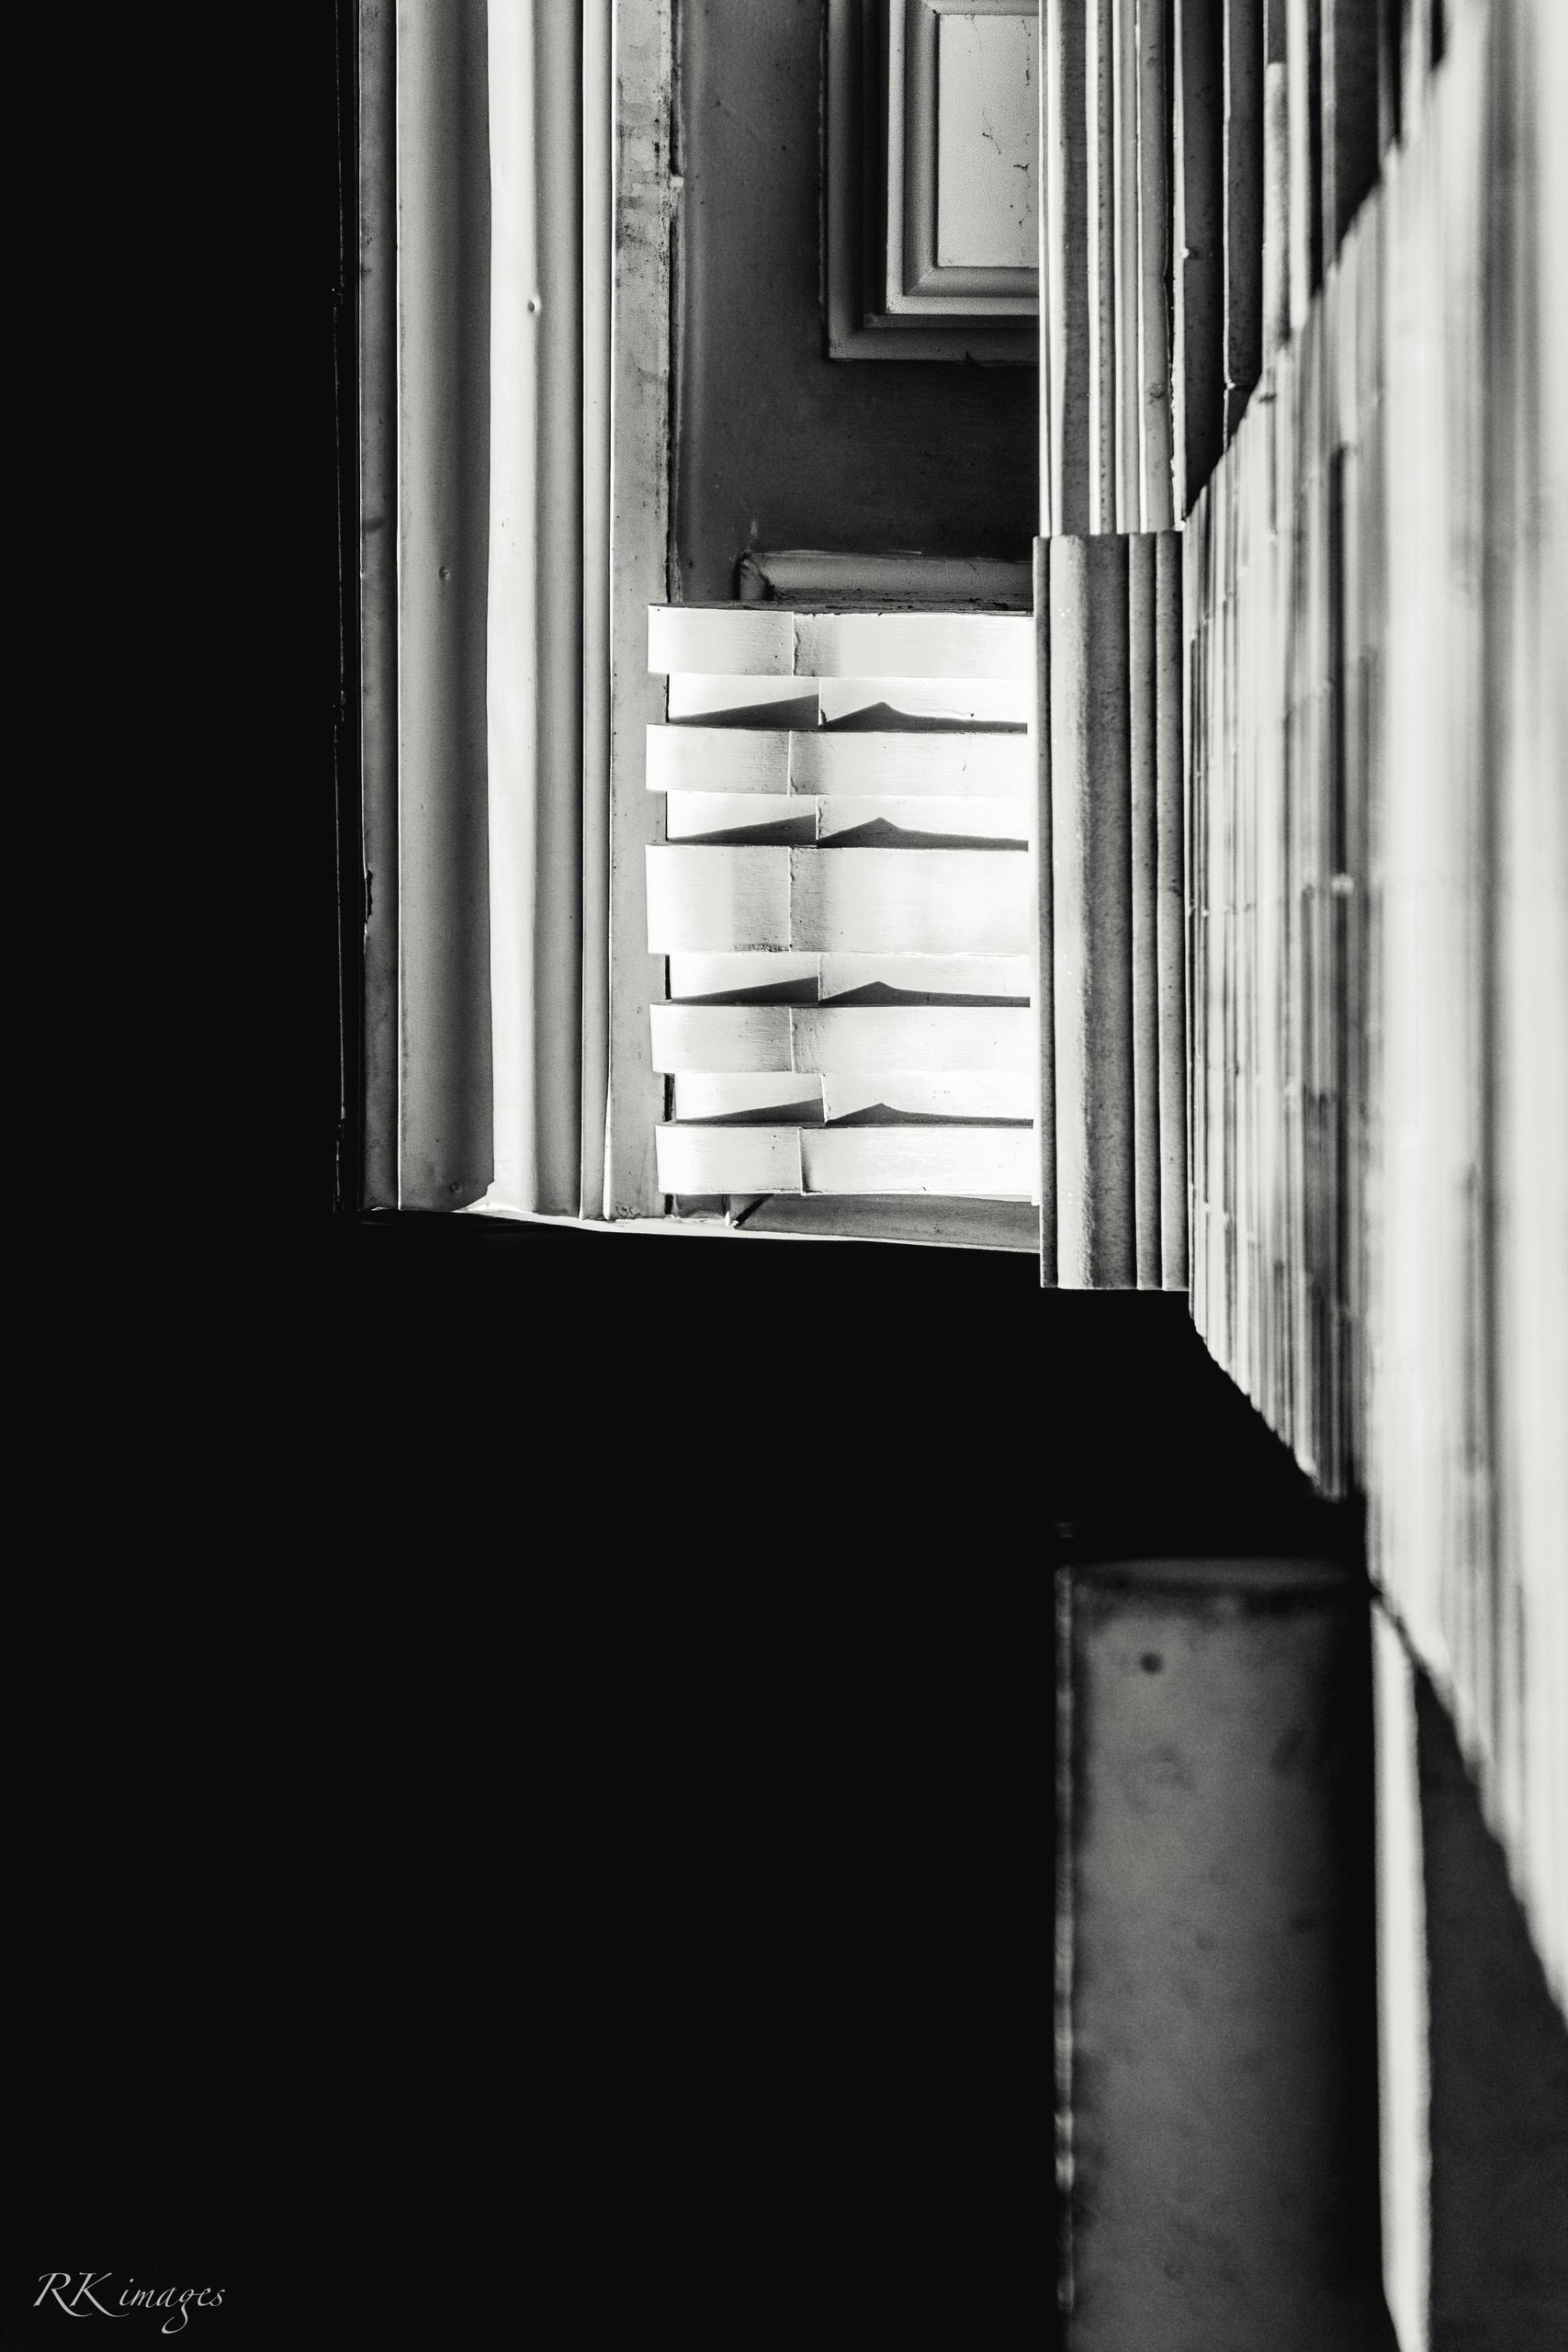 blackandwhite, architecture - richiekidd | ello